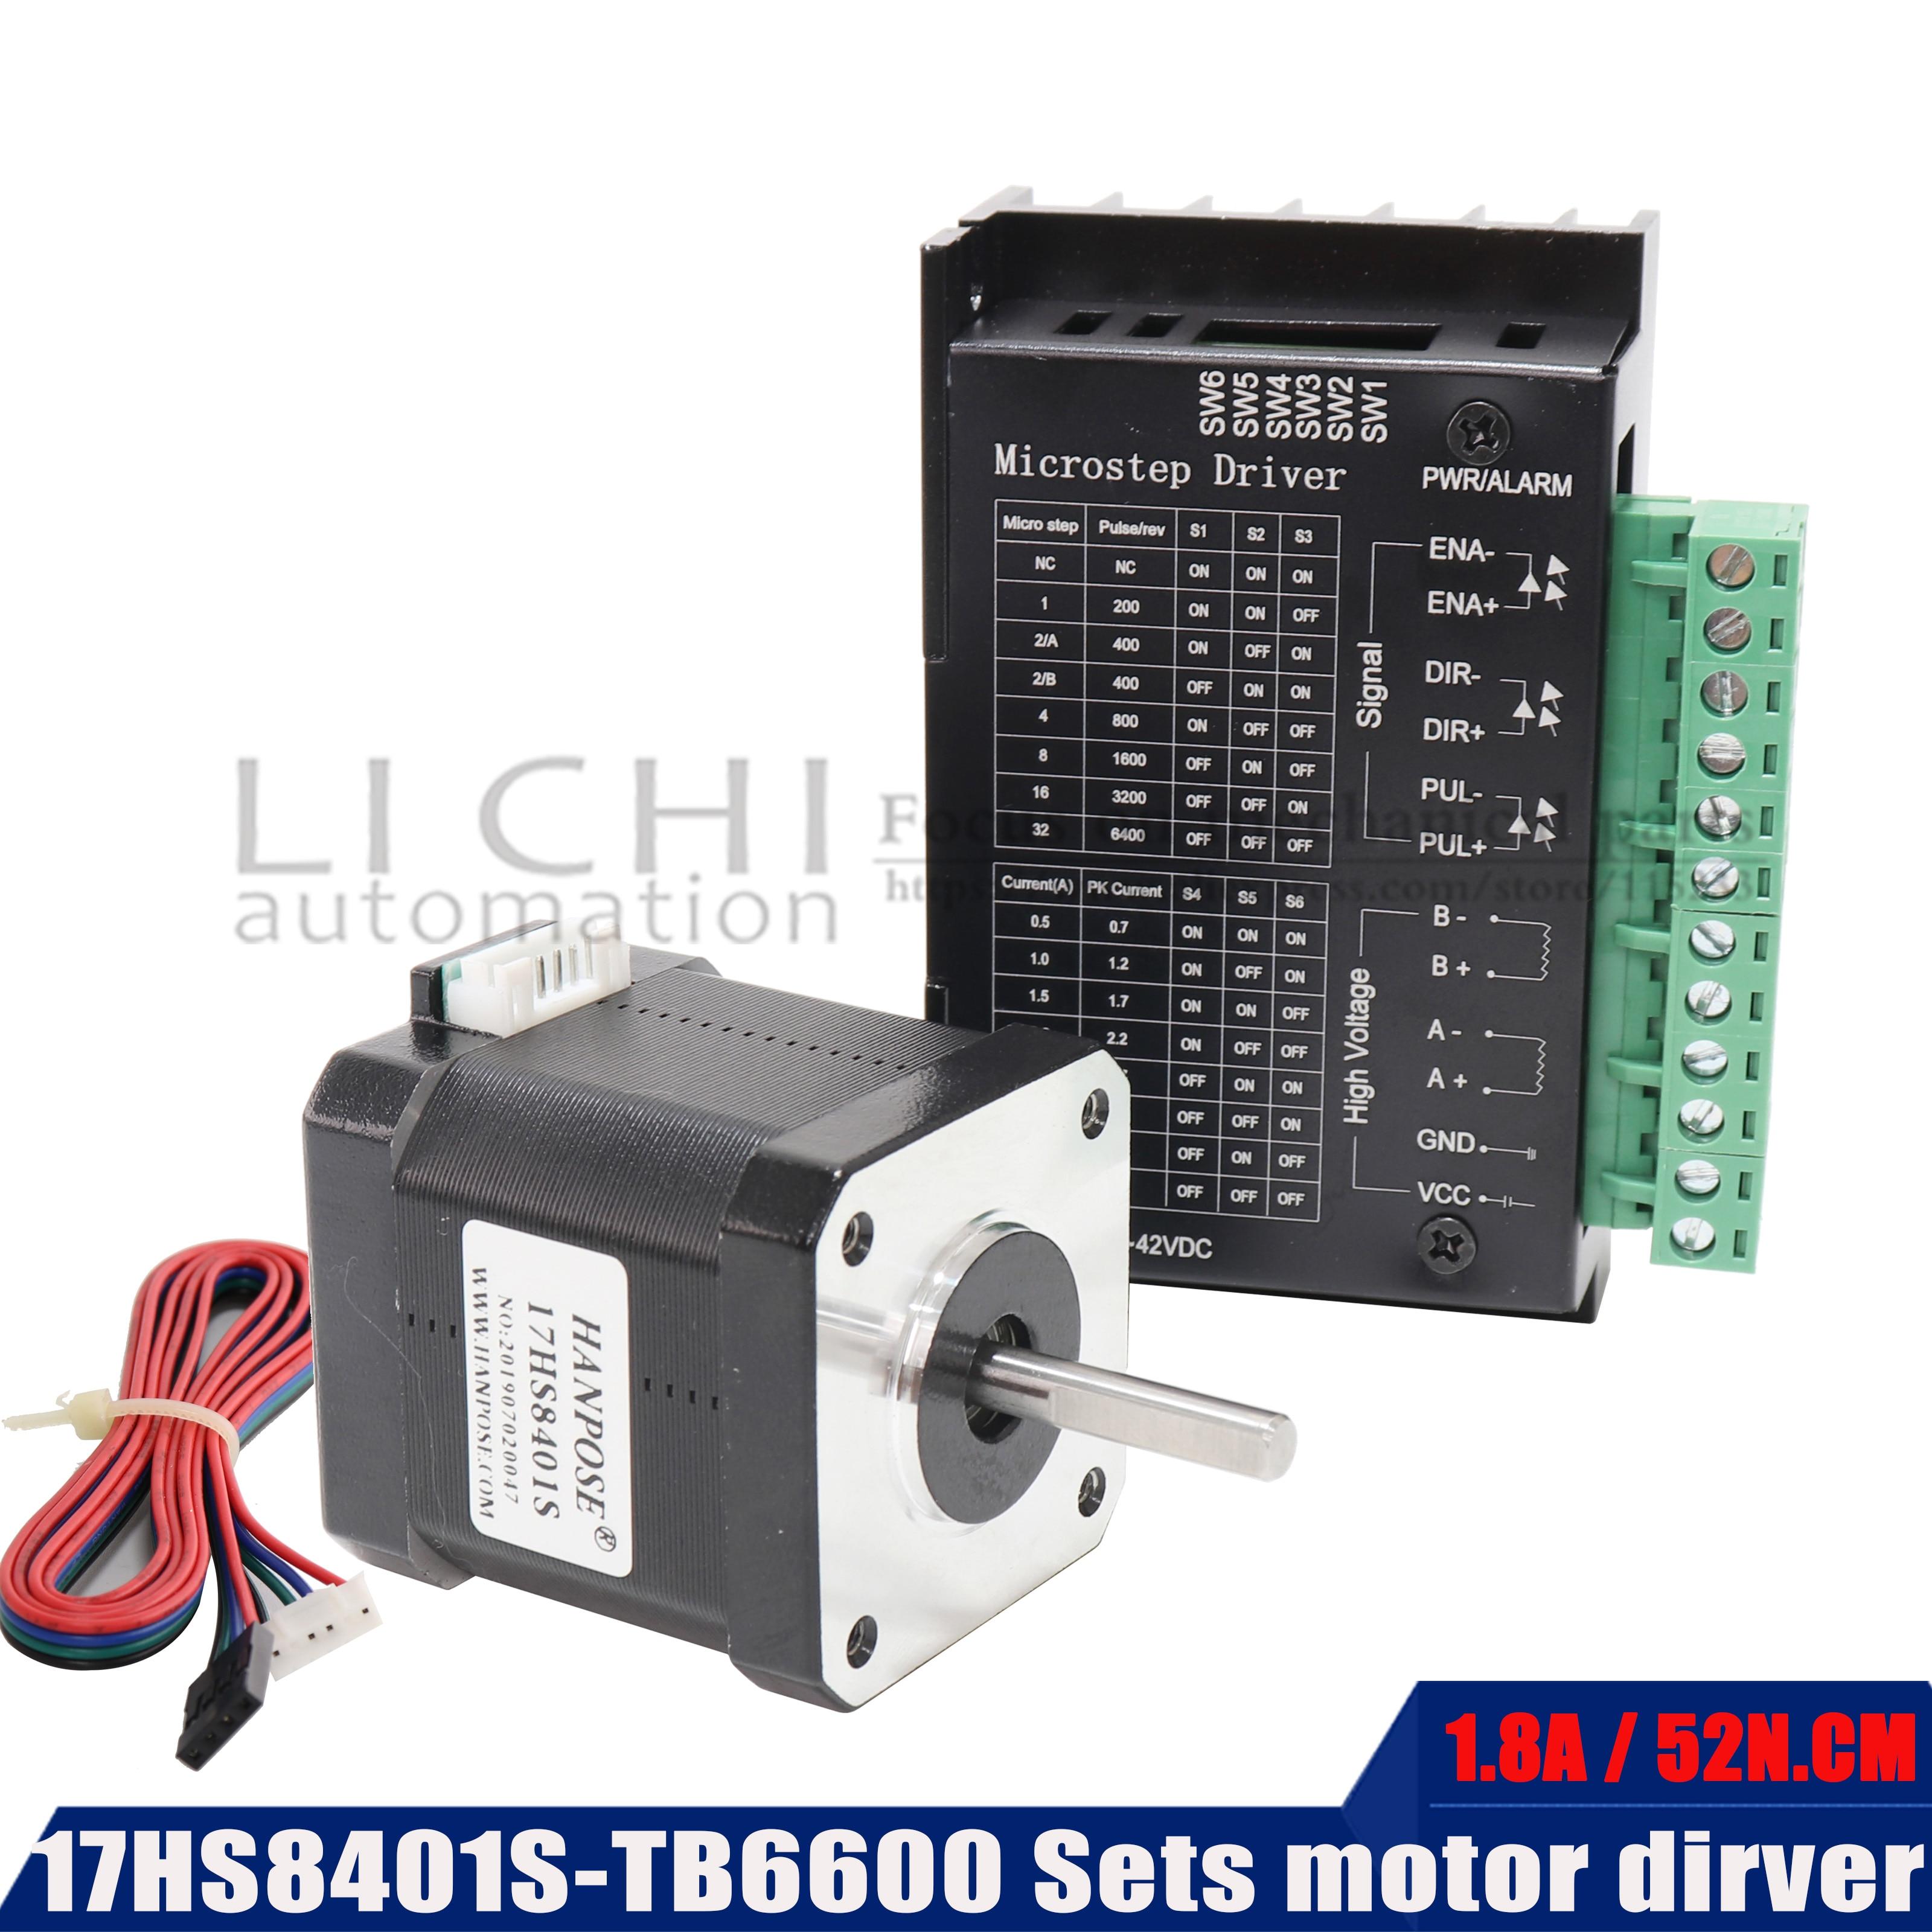 Nema17 1.8A (17HS8401)with TB6600 Stepper Motor 42 motor 52n.cm stepper motor driver 3D printer 4-lead